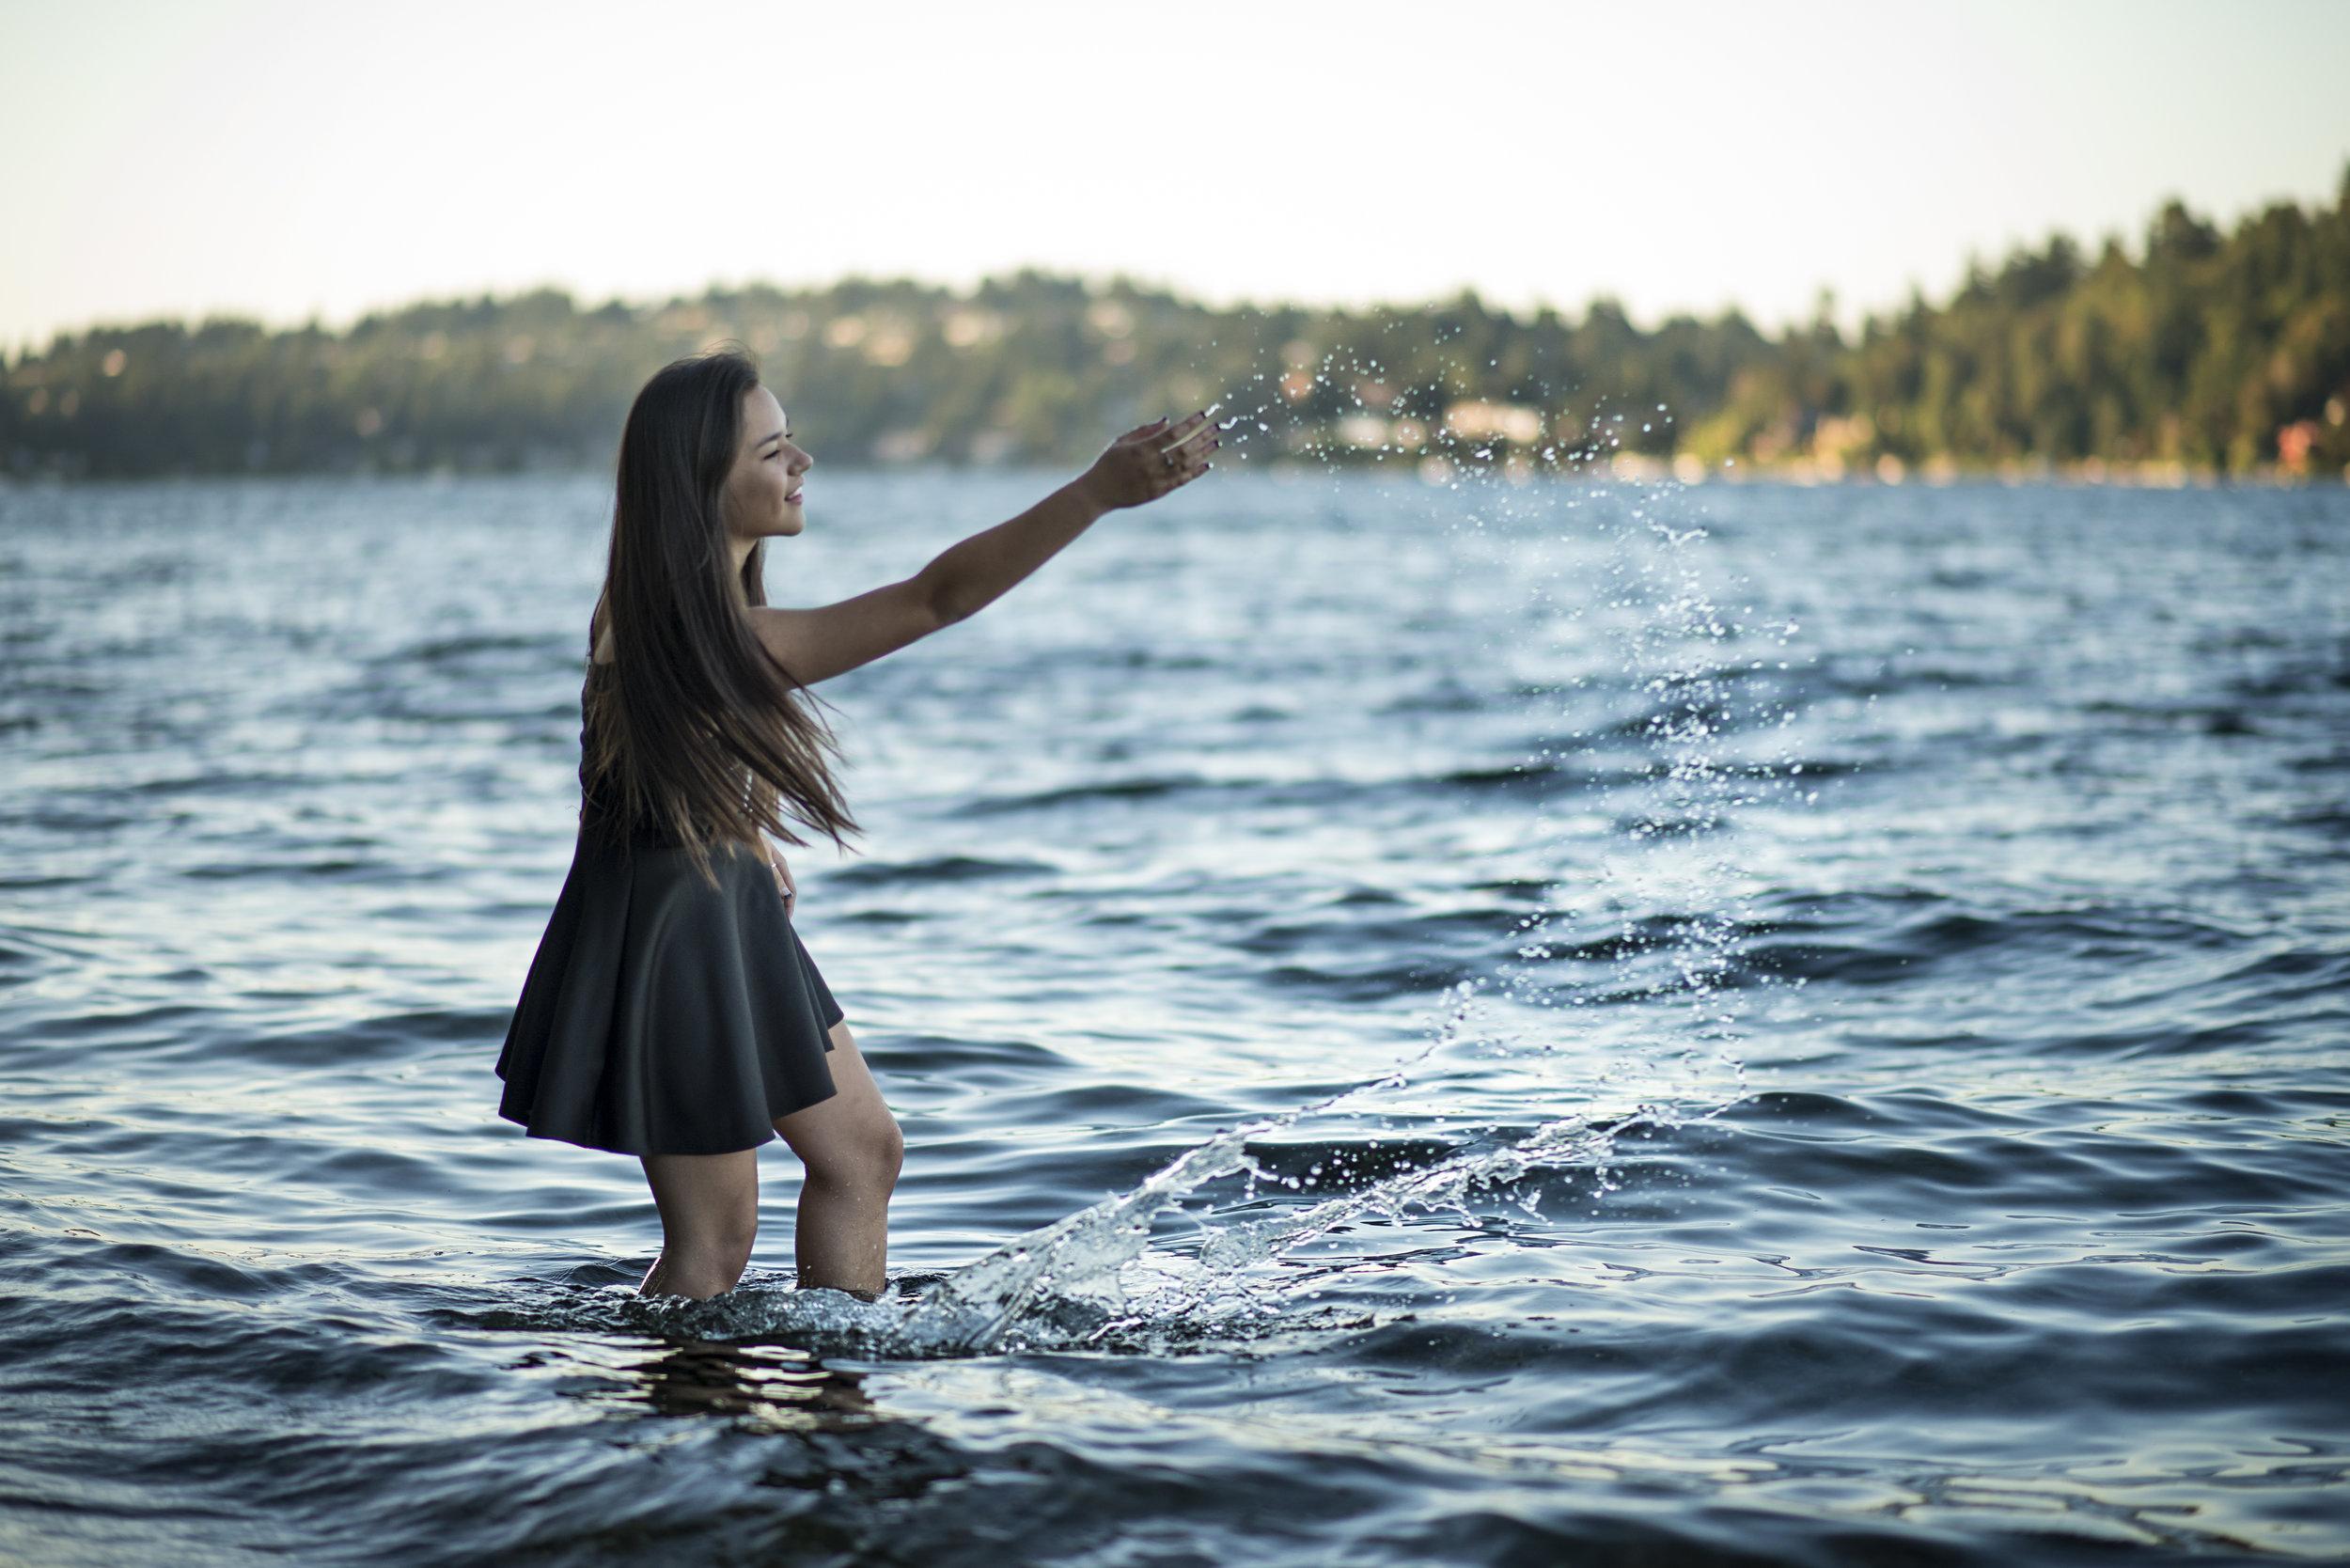 Mary Vance Photographer Senior Girl Photographer Mercer Island Washington Water Luther Burbank Park